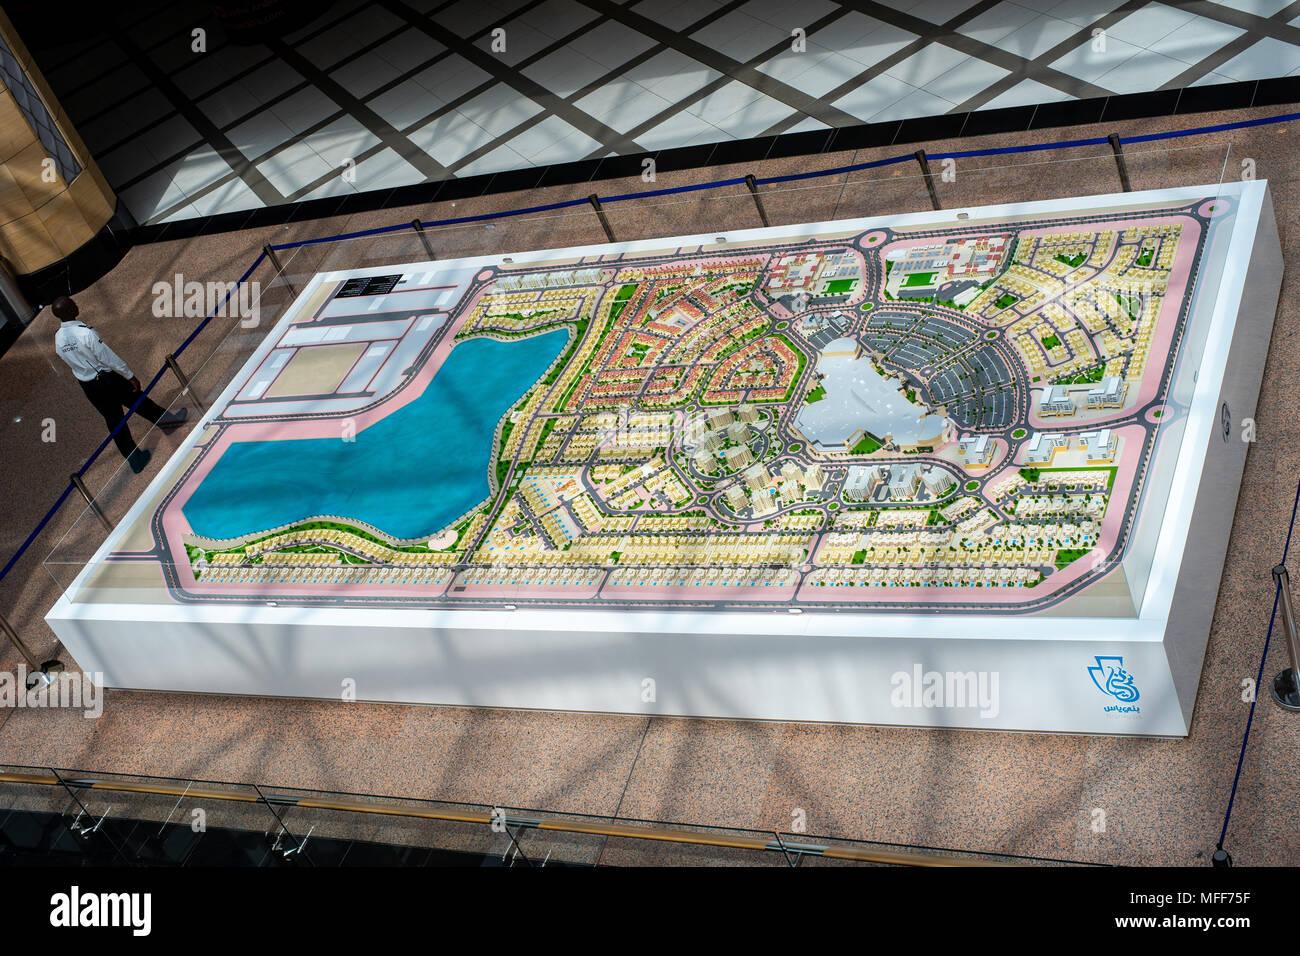 Giant 3d model, Plan of new city in Abu Dhabi - Stock Image